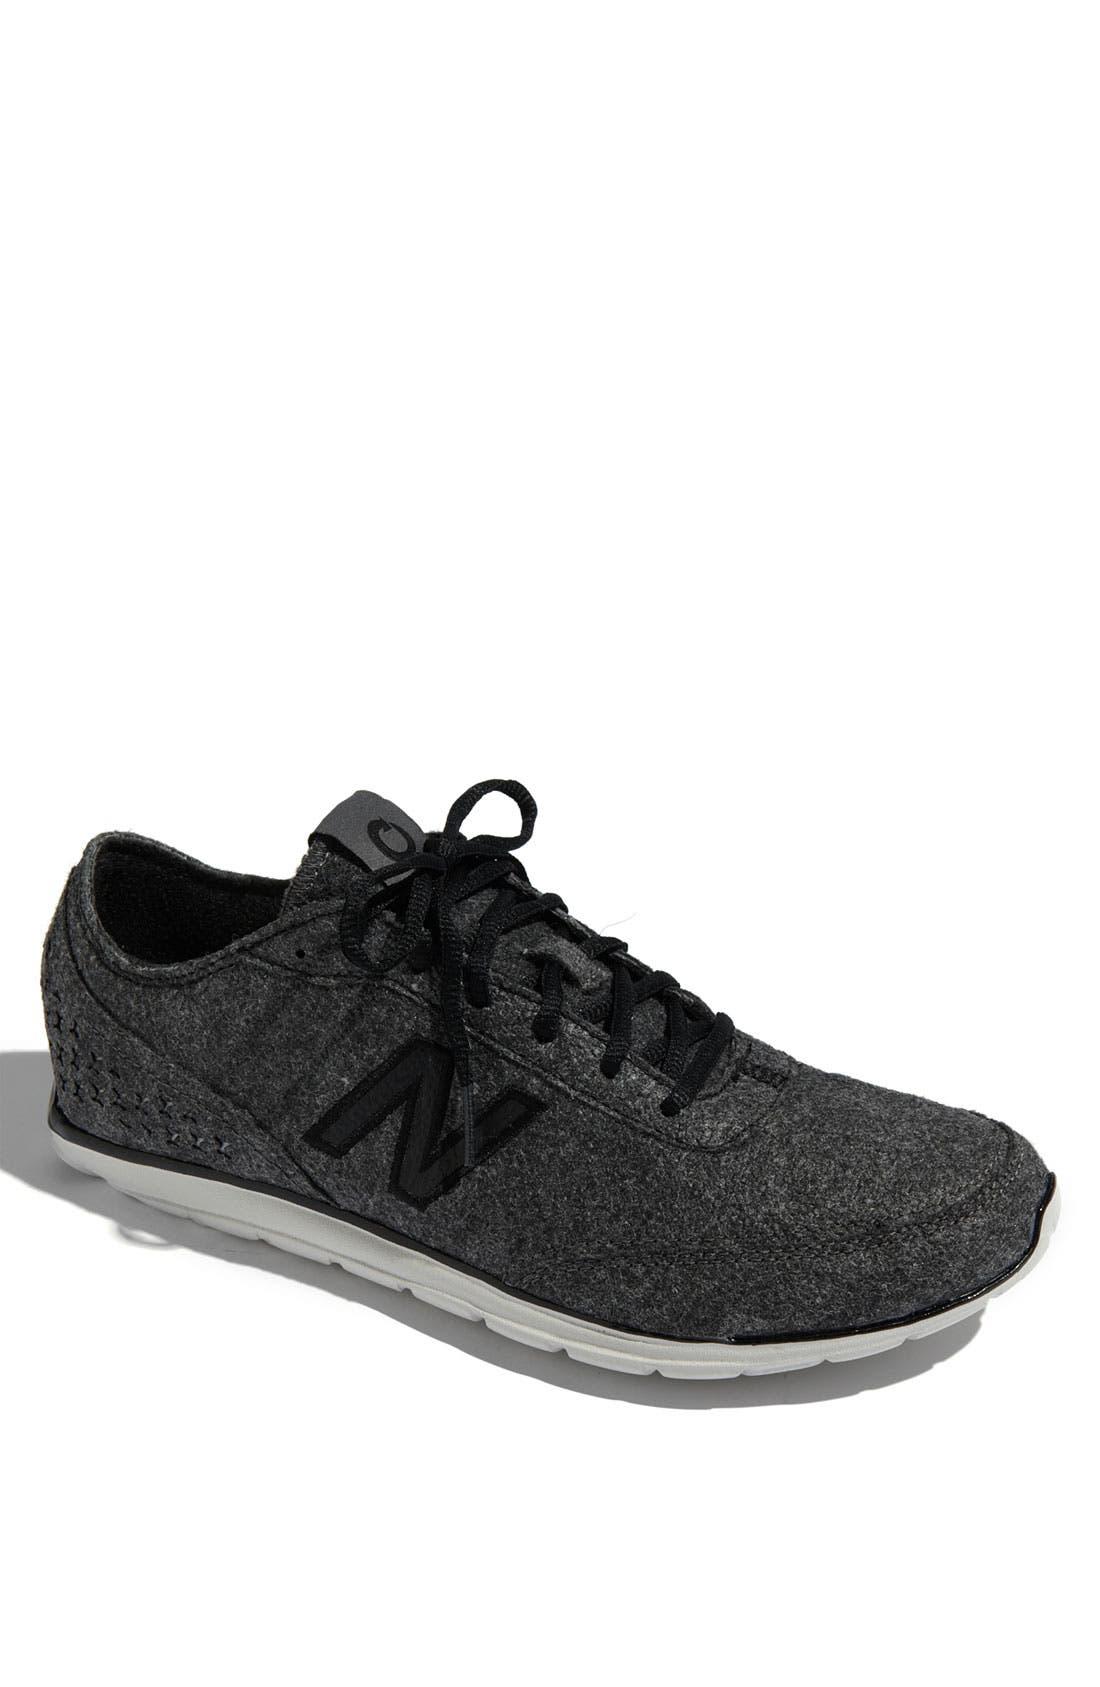 Alternate Image 1 Selected - New Balance 'newSKY' Sneaker (Men)